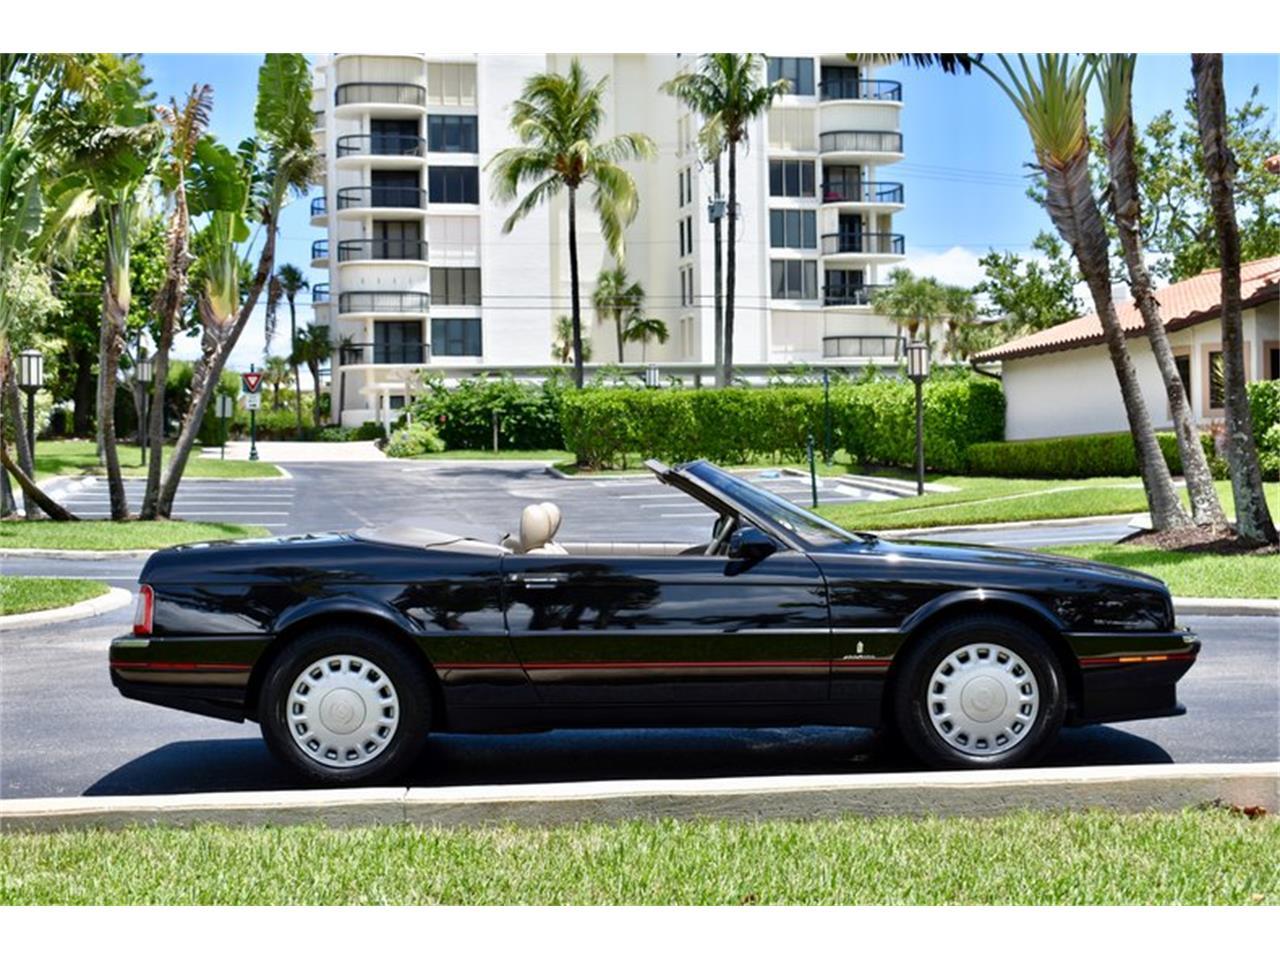 1993 Cadillac Allante (CC-1134221) for sale in Delray Beach, Florida